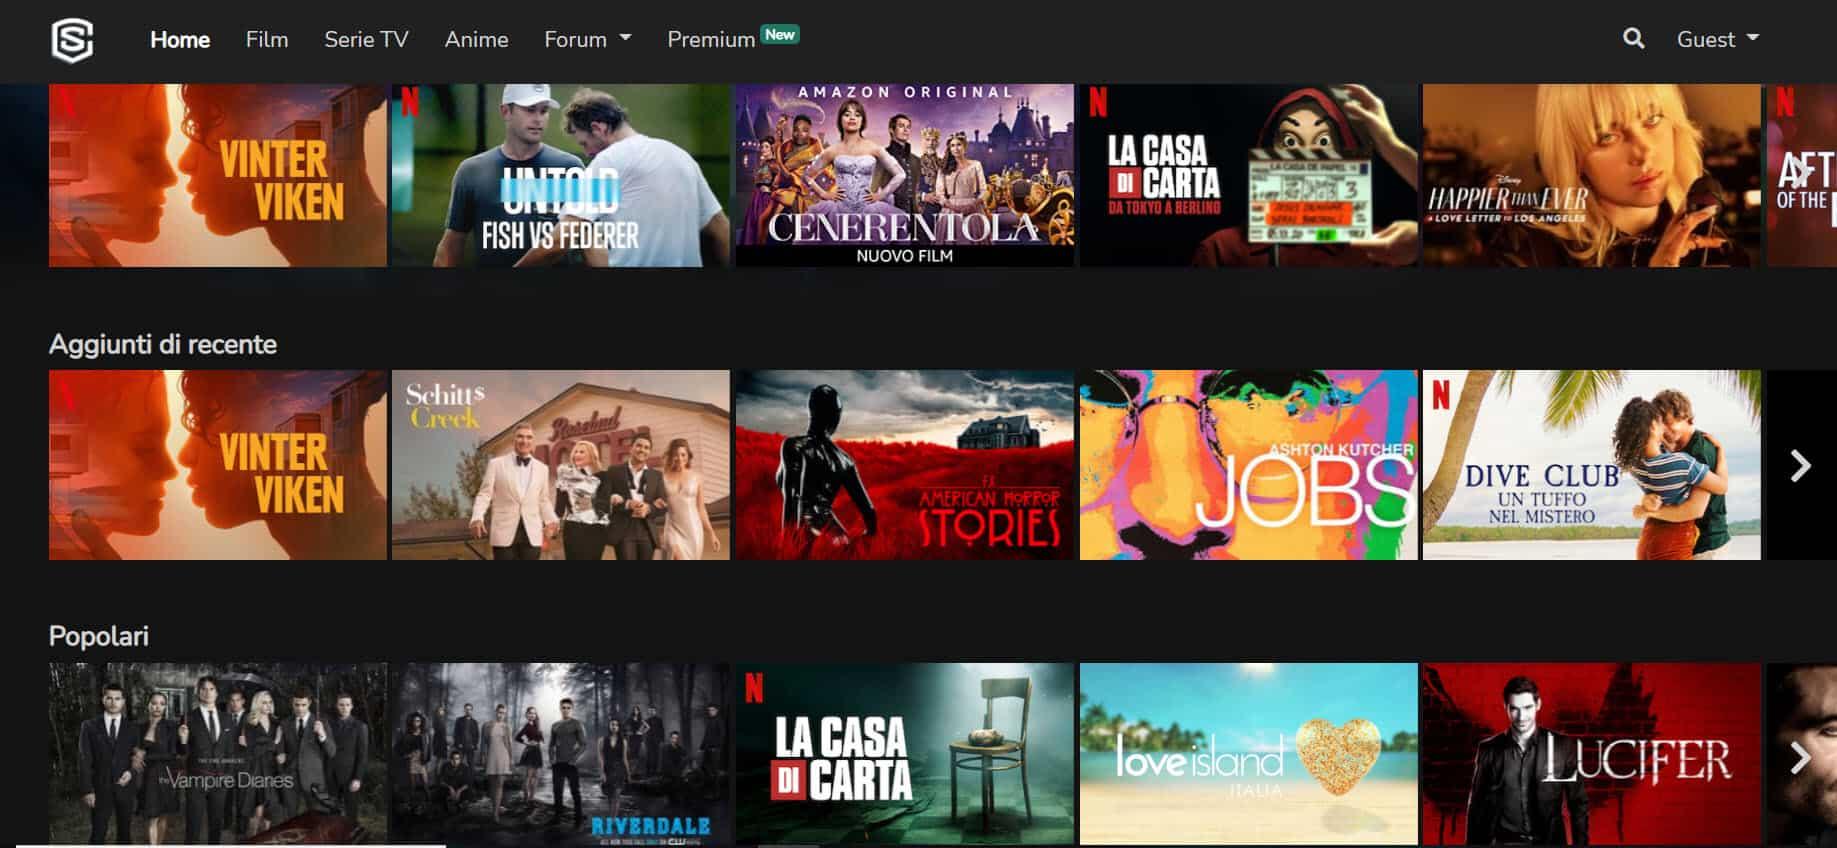 Streamingcommunity Nuovo Indirizzo Sito Streaming Gratis